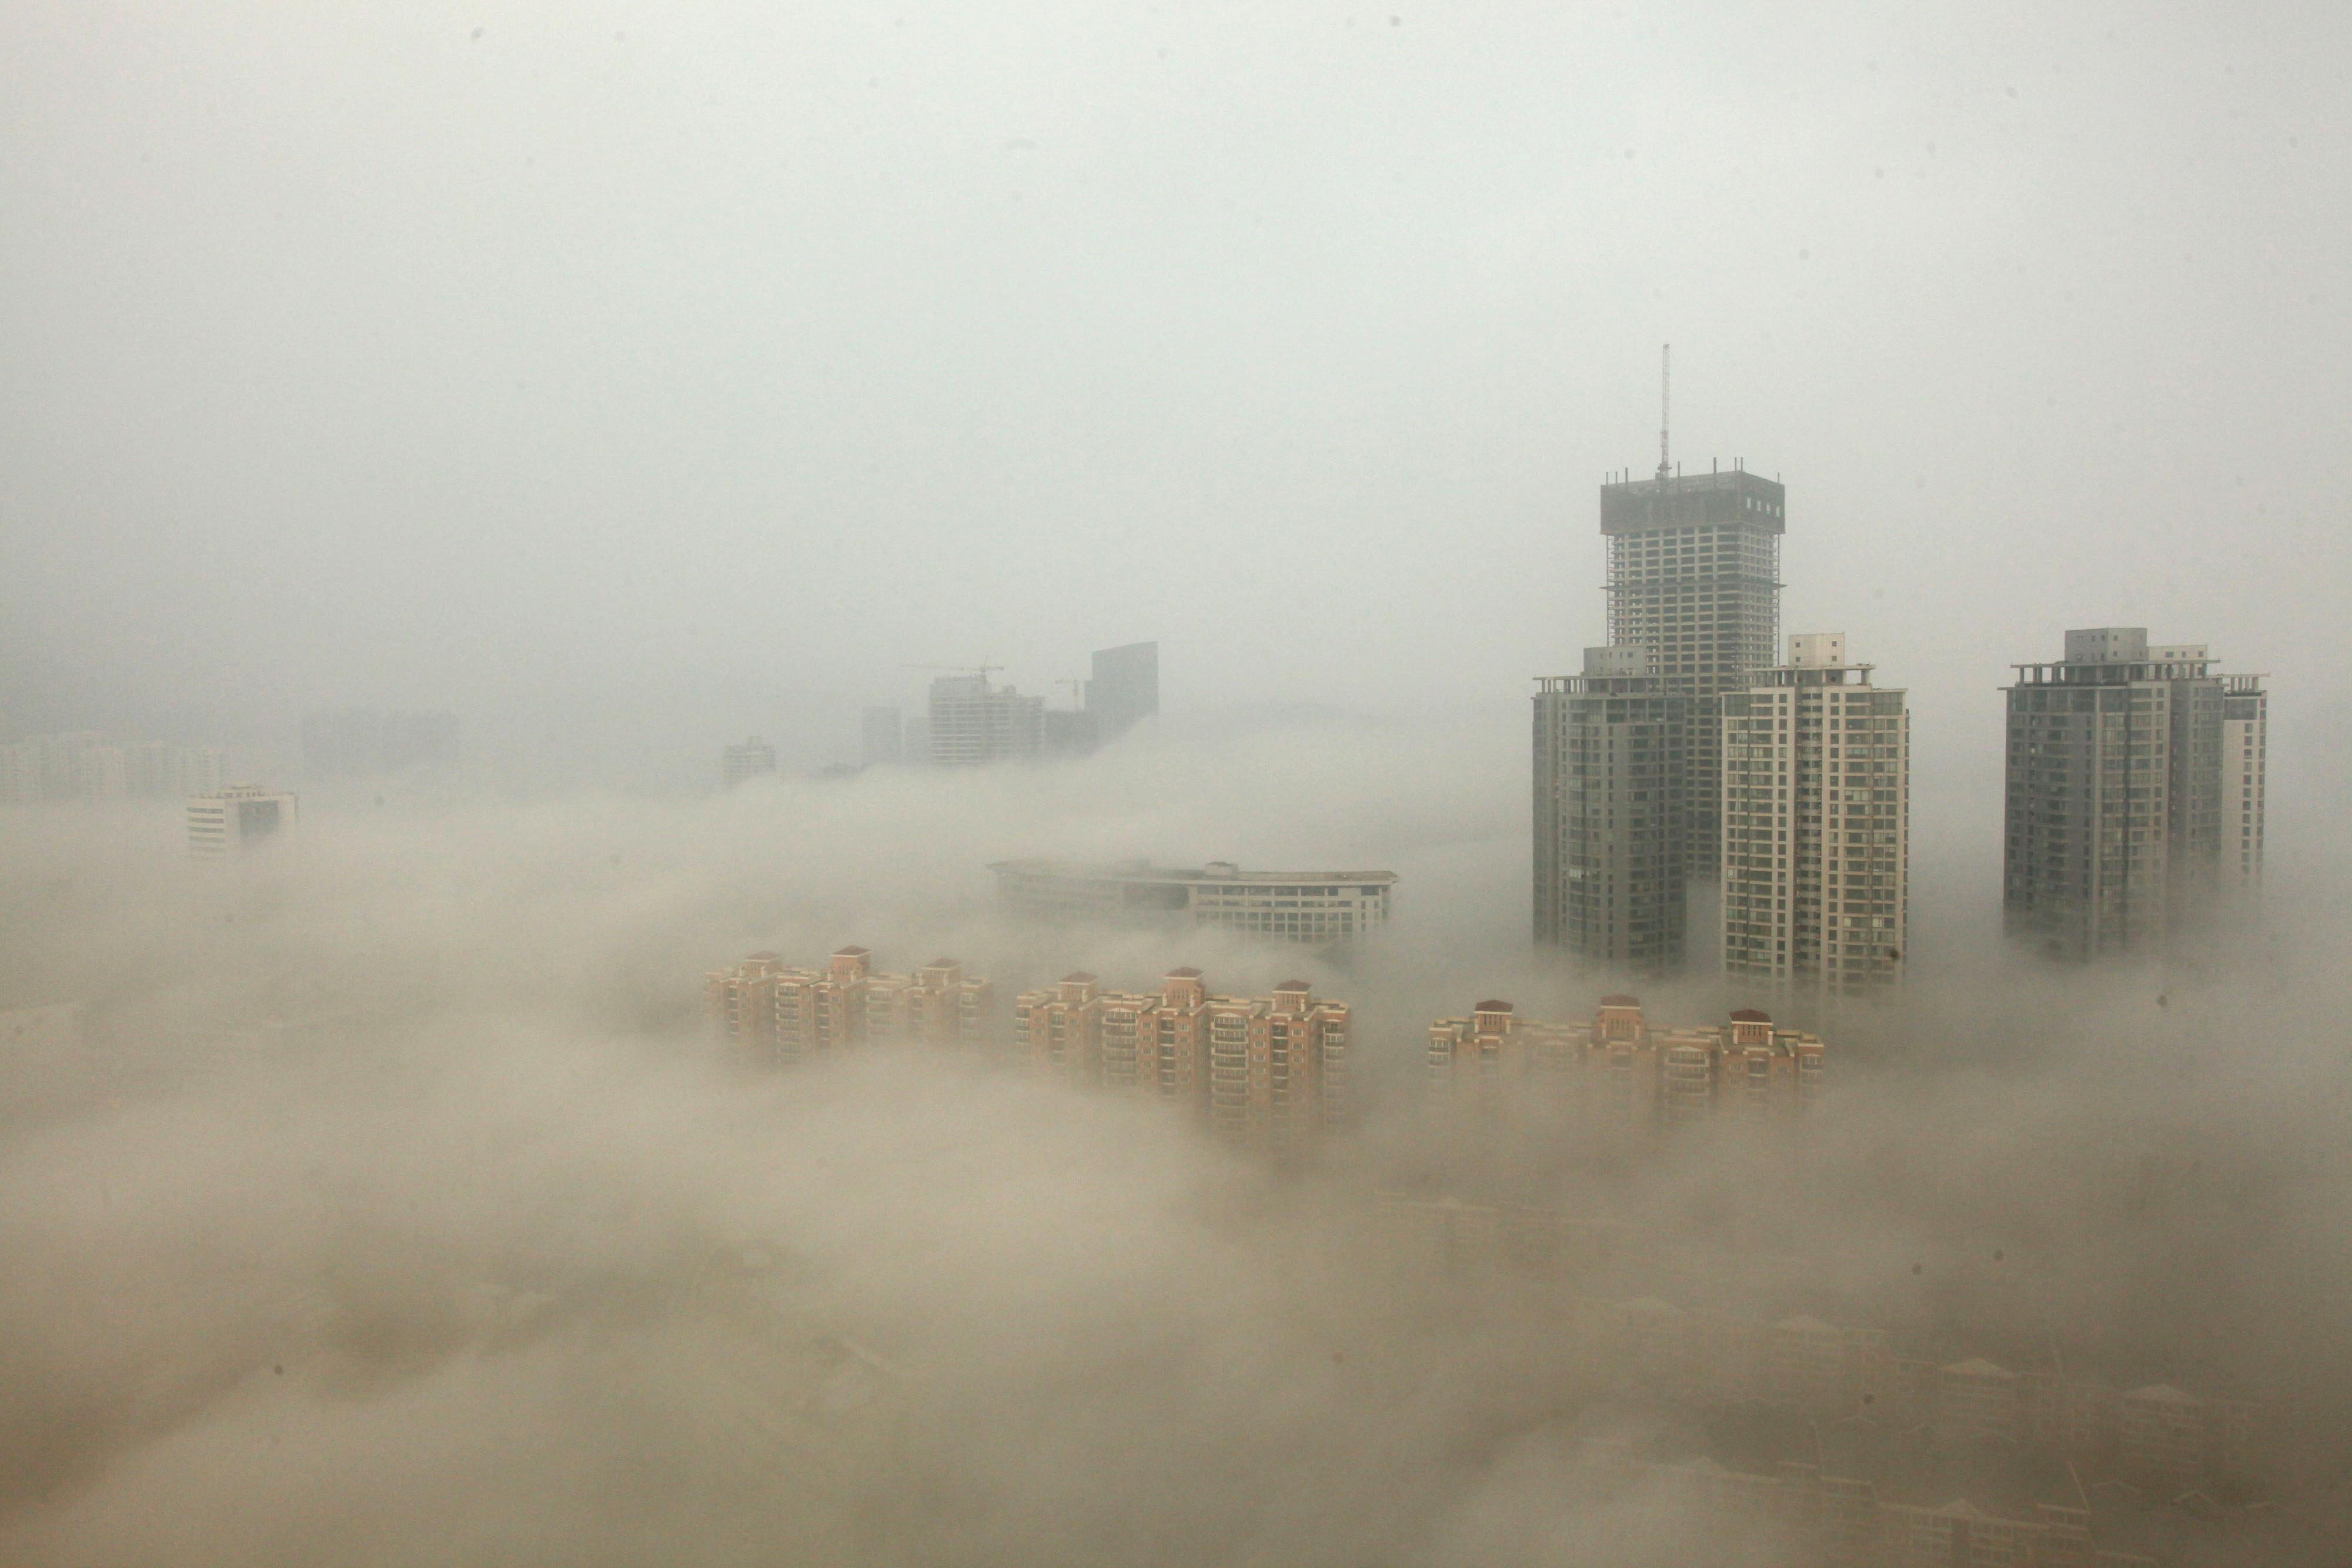 Melting Arctic ice likely worsens winter haze in China